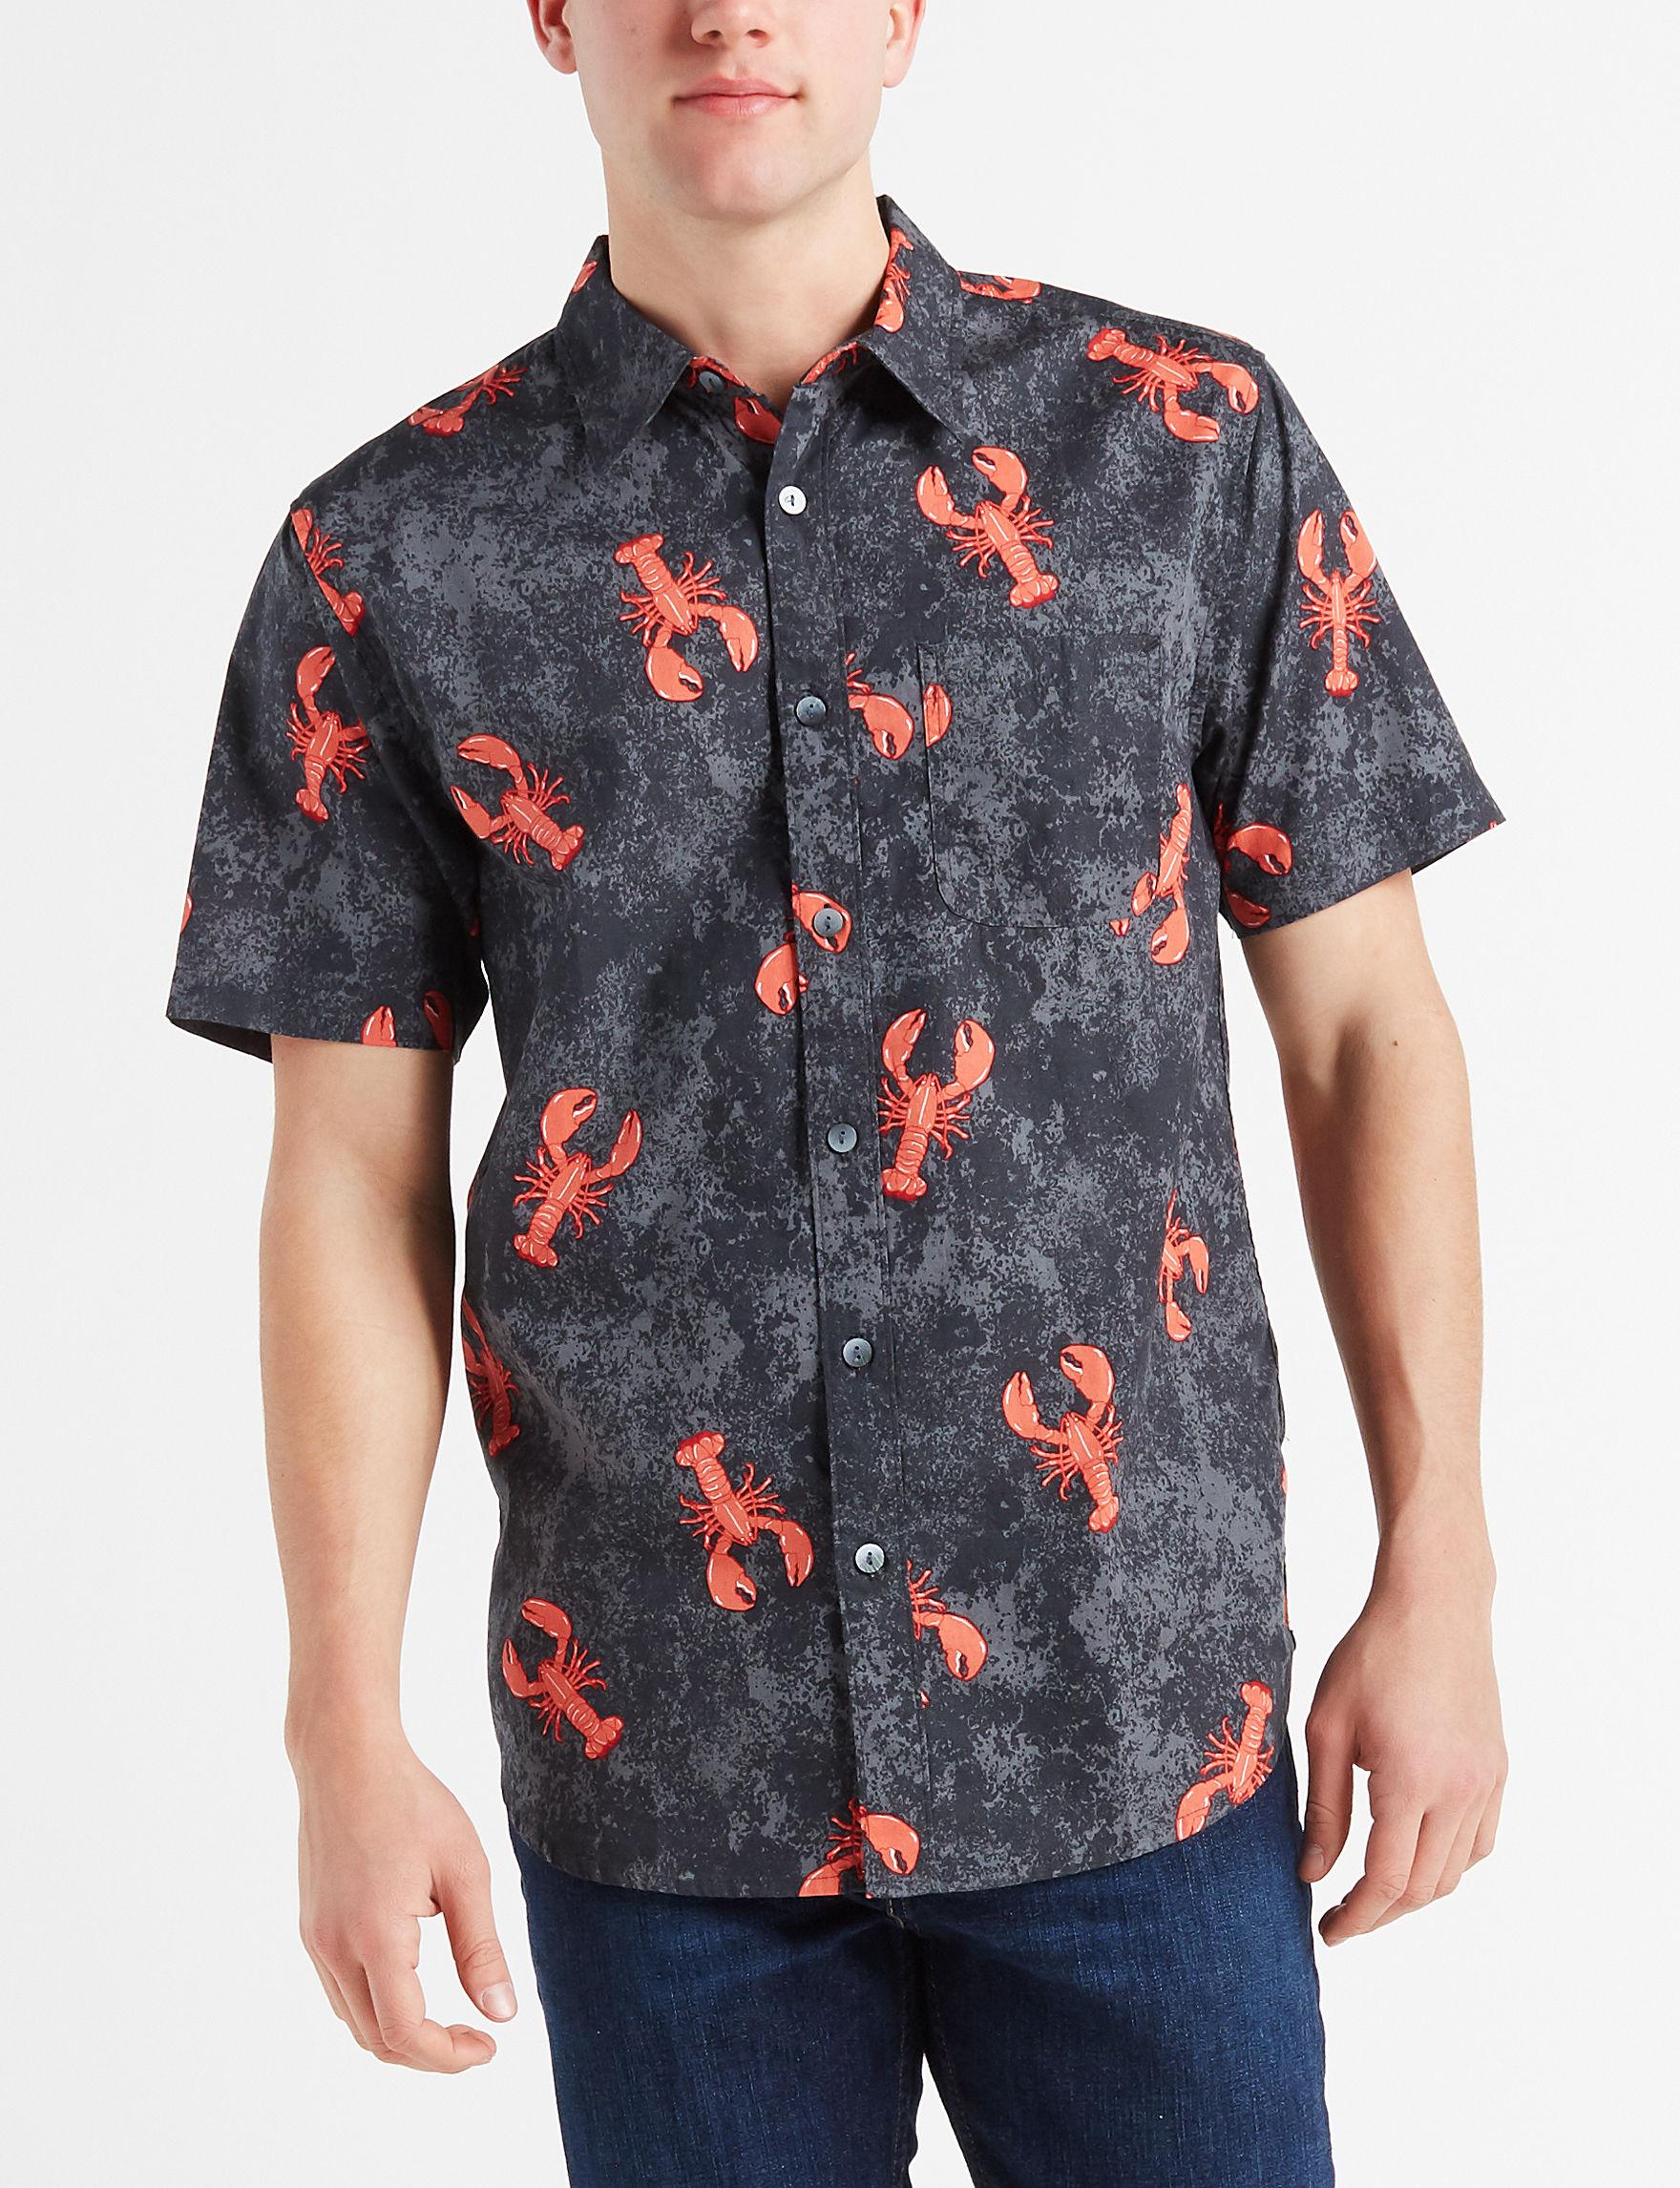 Ocean Current Dark Grey Casual Button Down Shirts